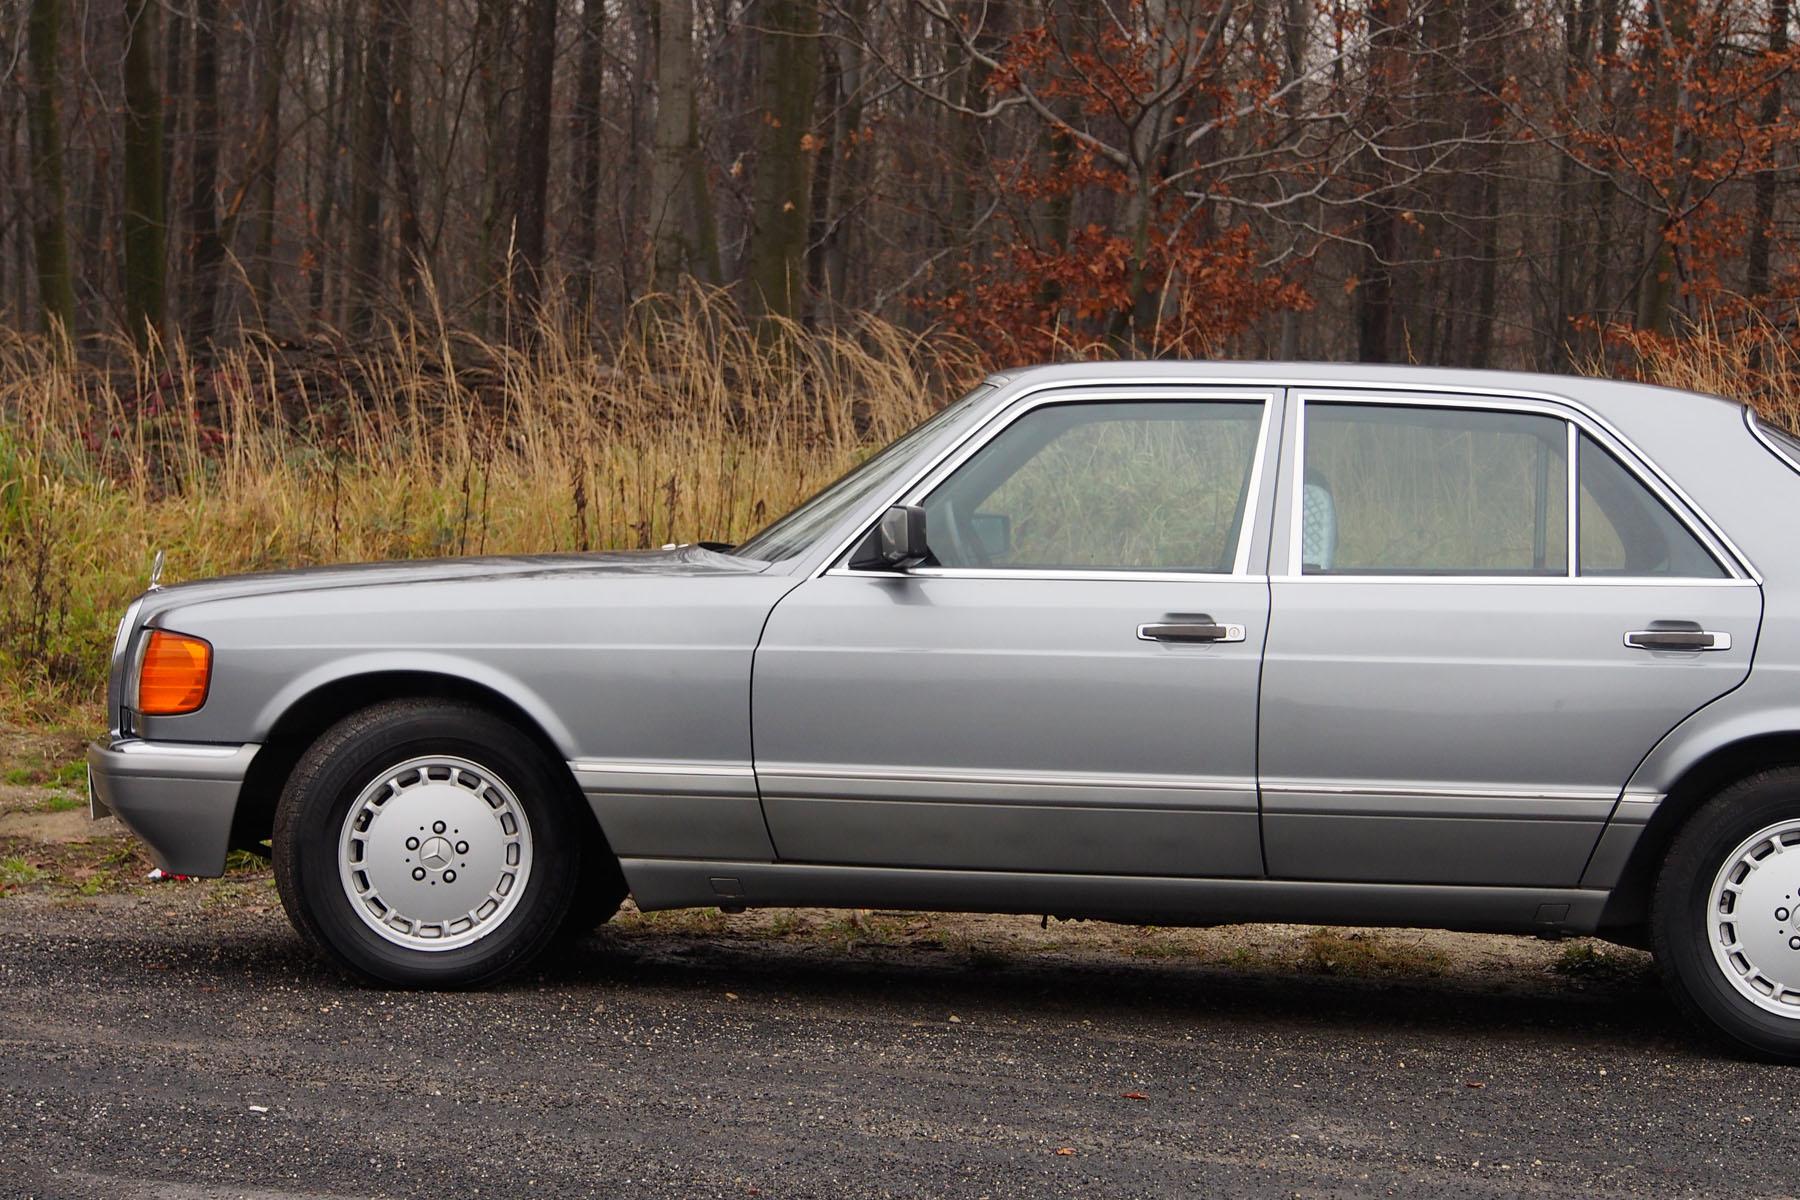 86 mercedes benz 300 se nowex cars for Mercedes benz 300 se